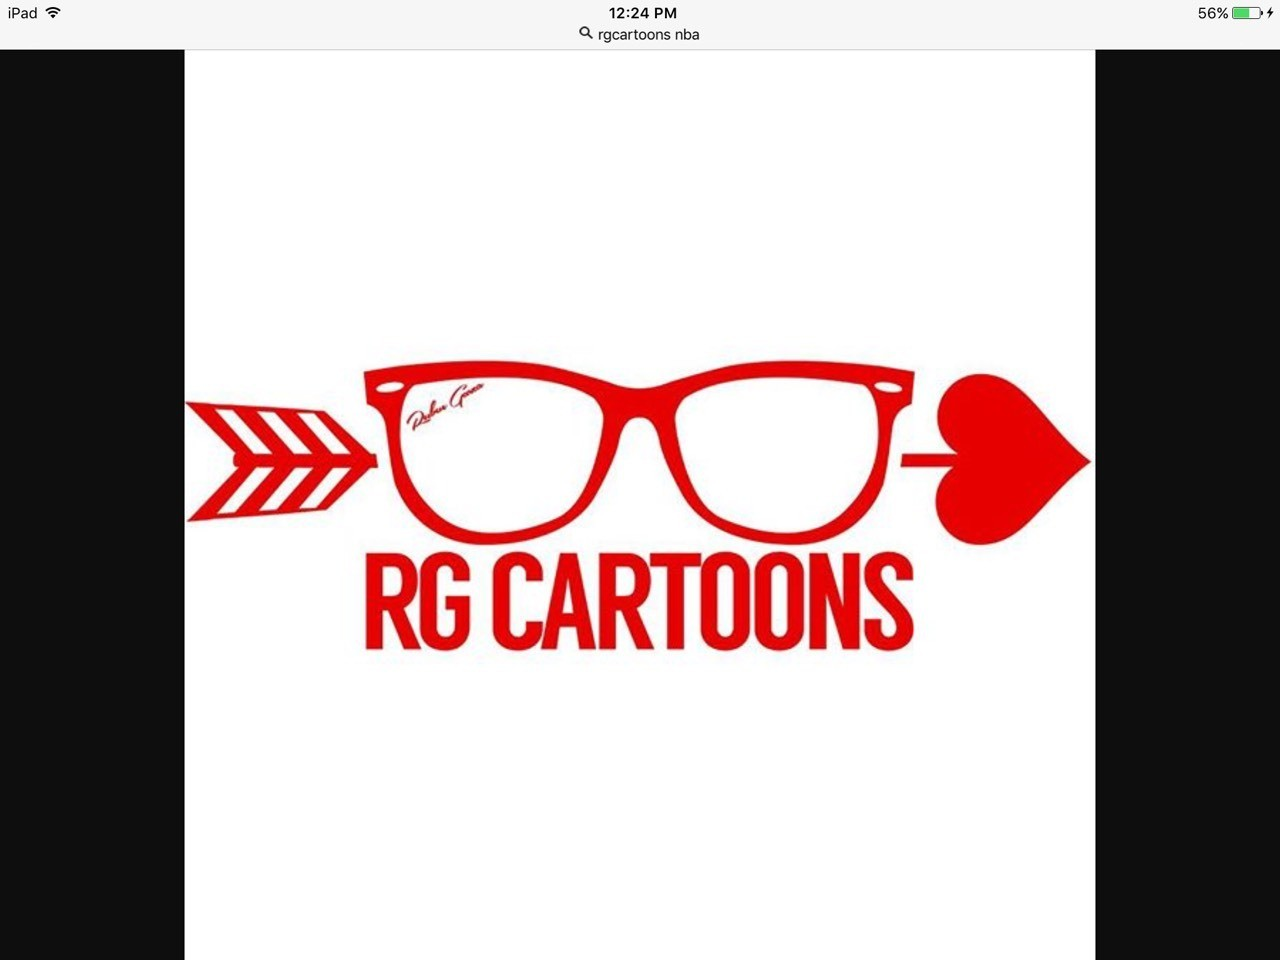 Rg Cartoons